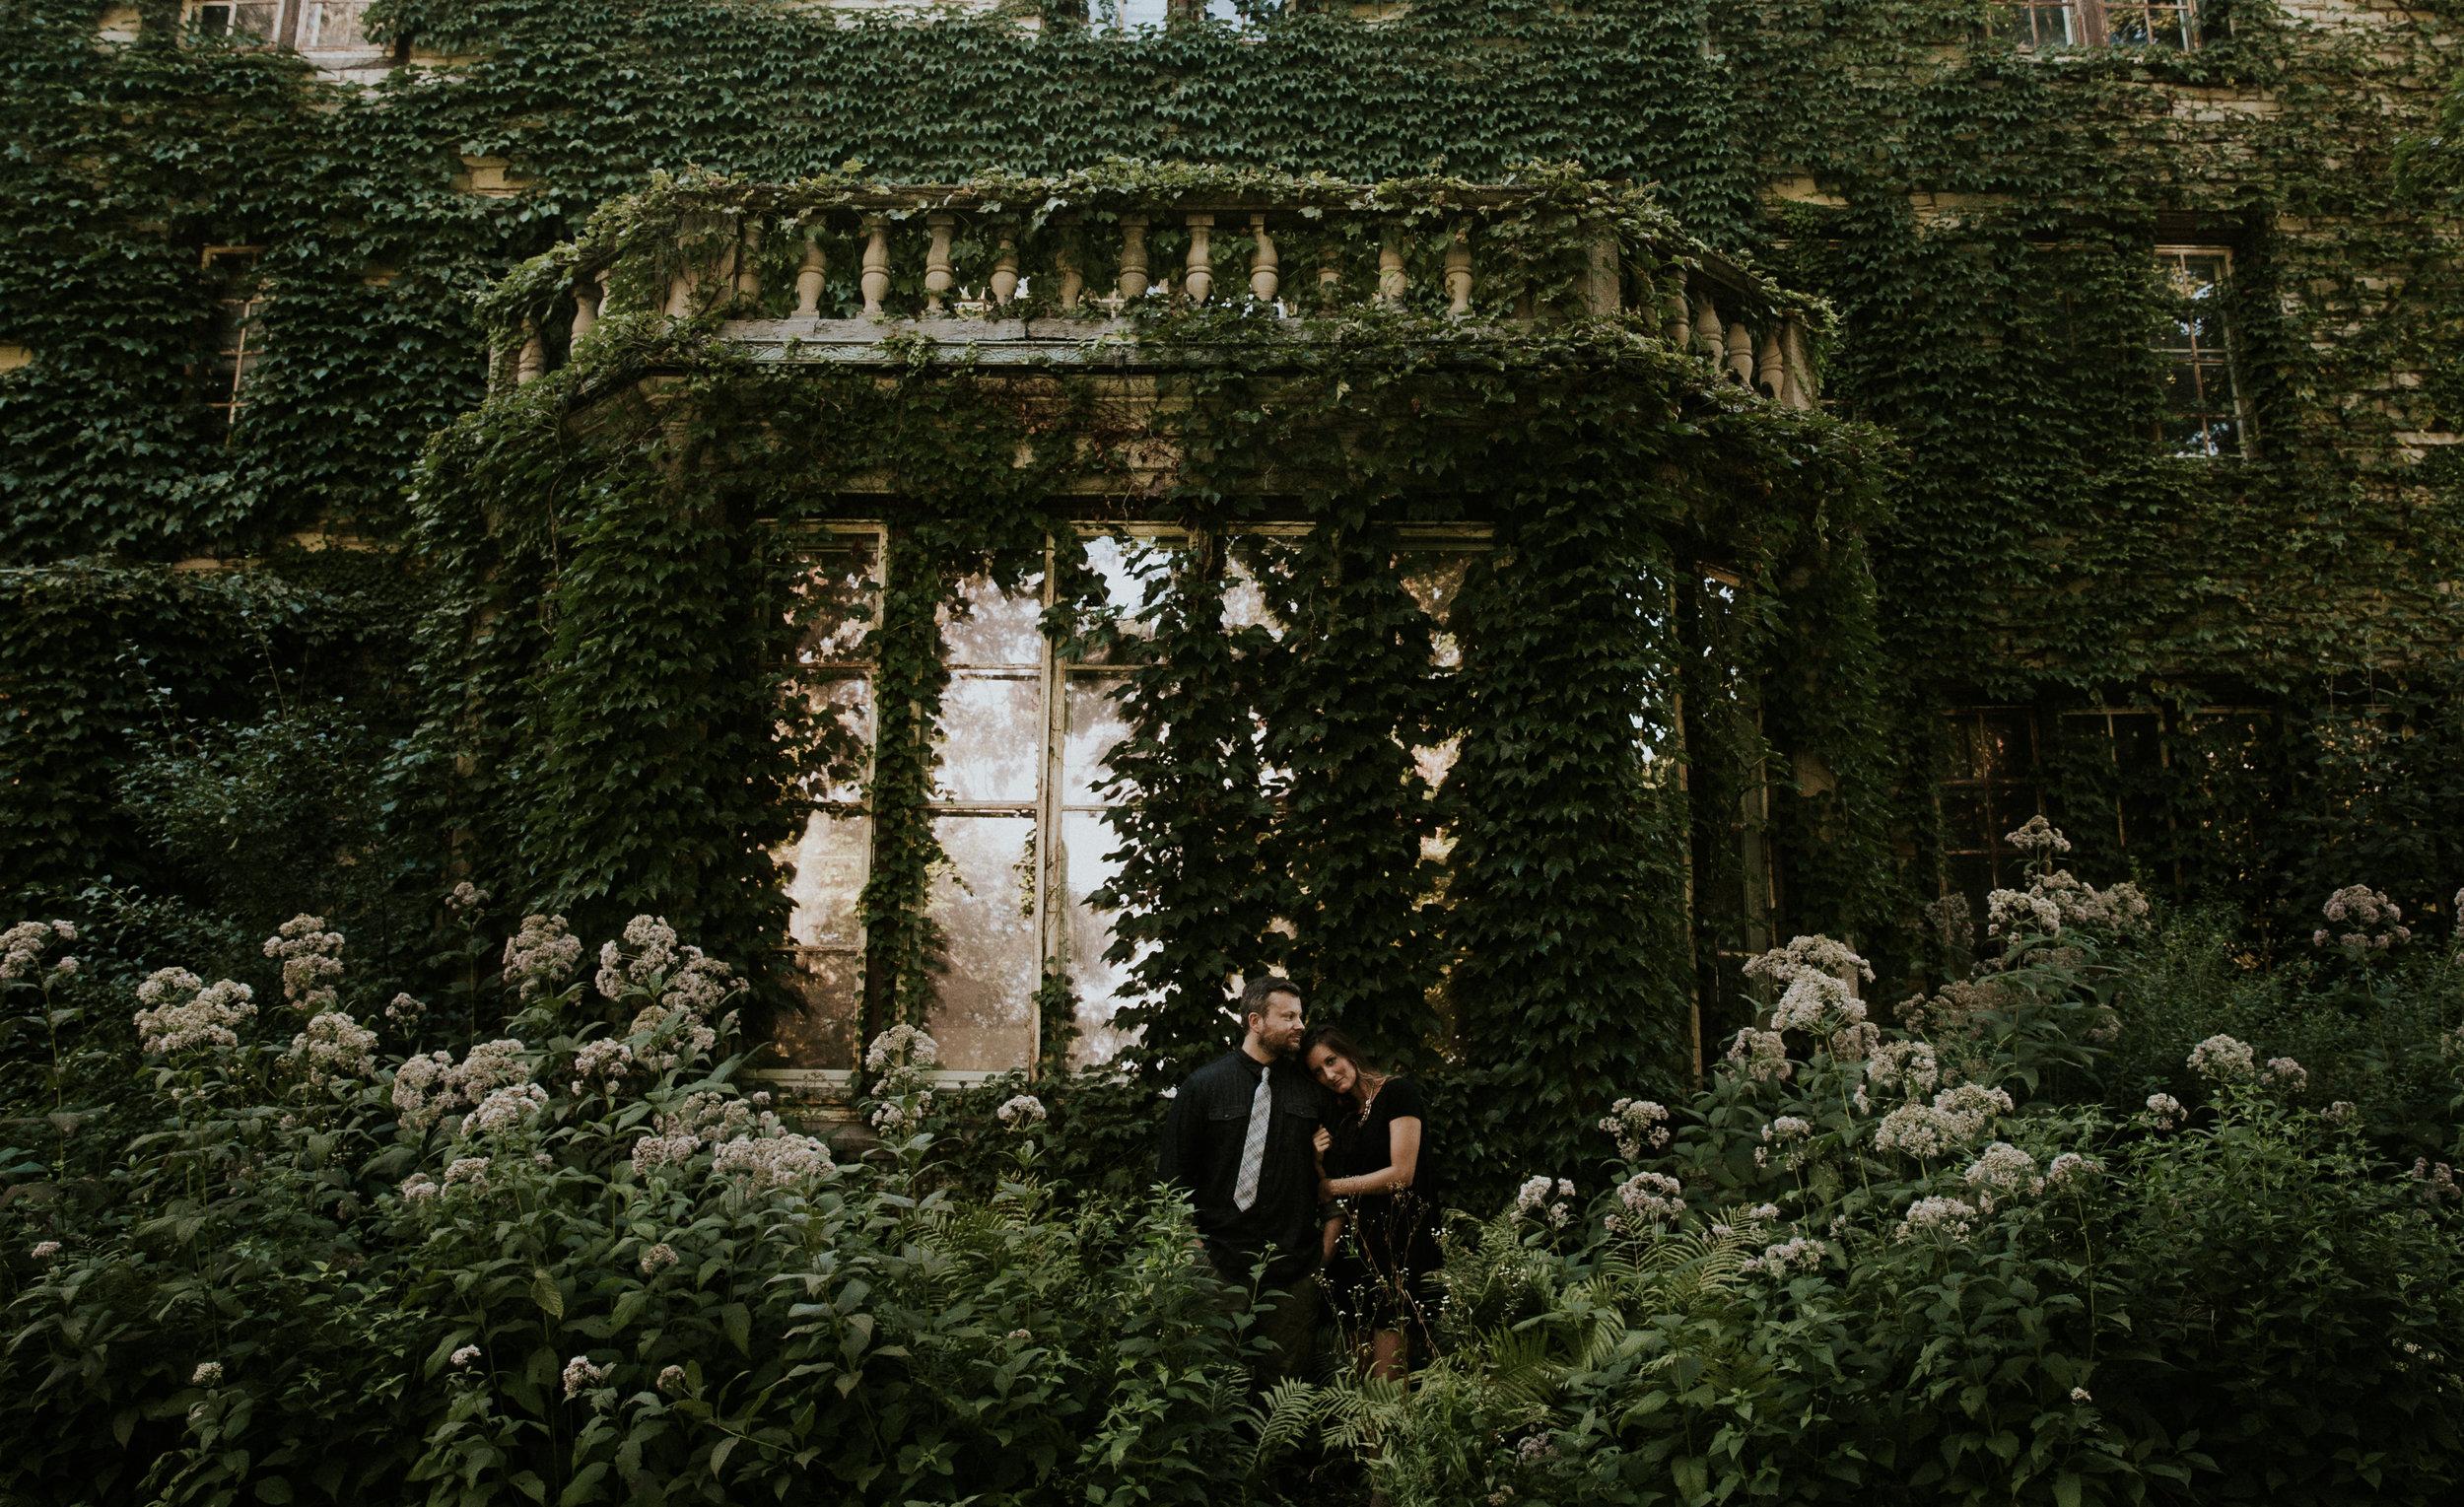 Amanda_Evanston-1.jpg